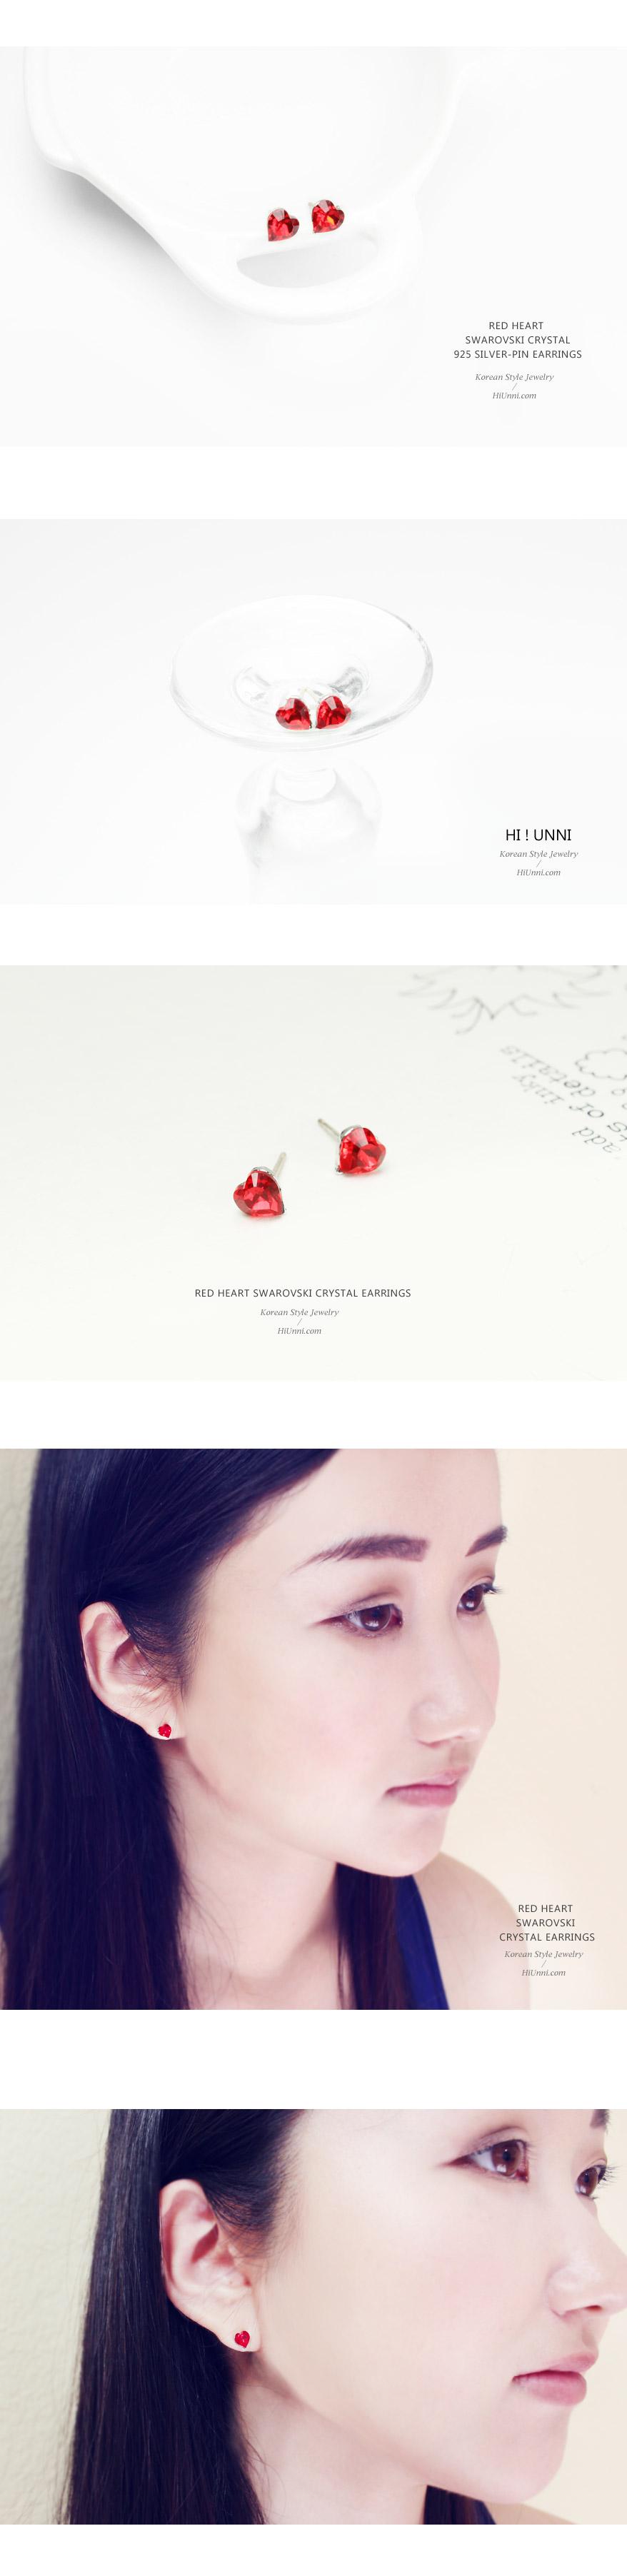 Jewelry_accessories_ear_stud_earrings_korean_asian-style_925-silver_Nickel-Free_Swarovski_Crystal_Rhodium_heart_red_4